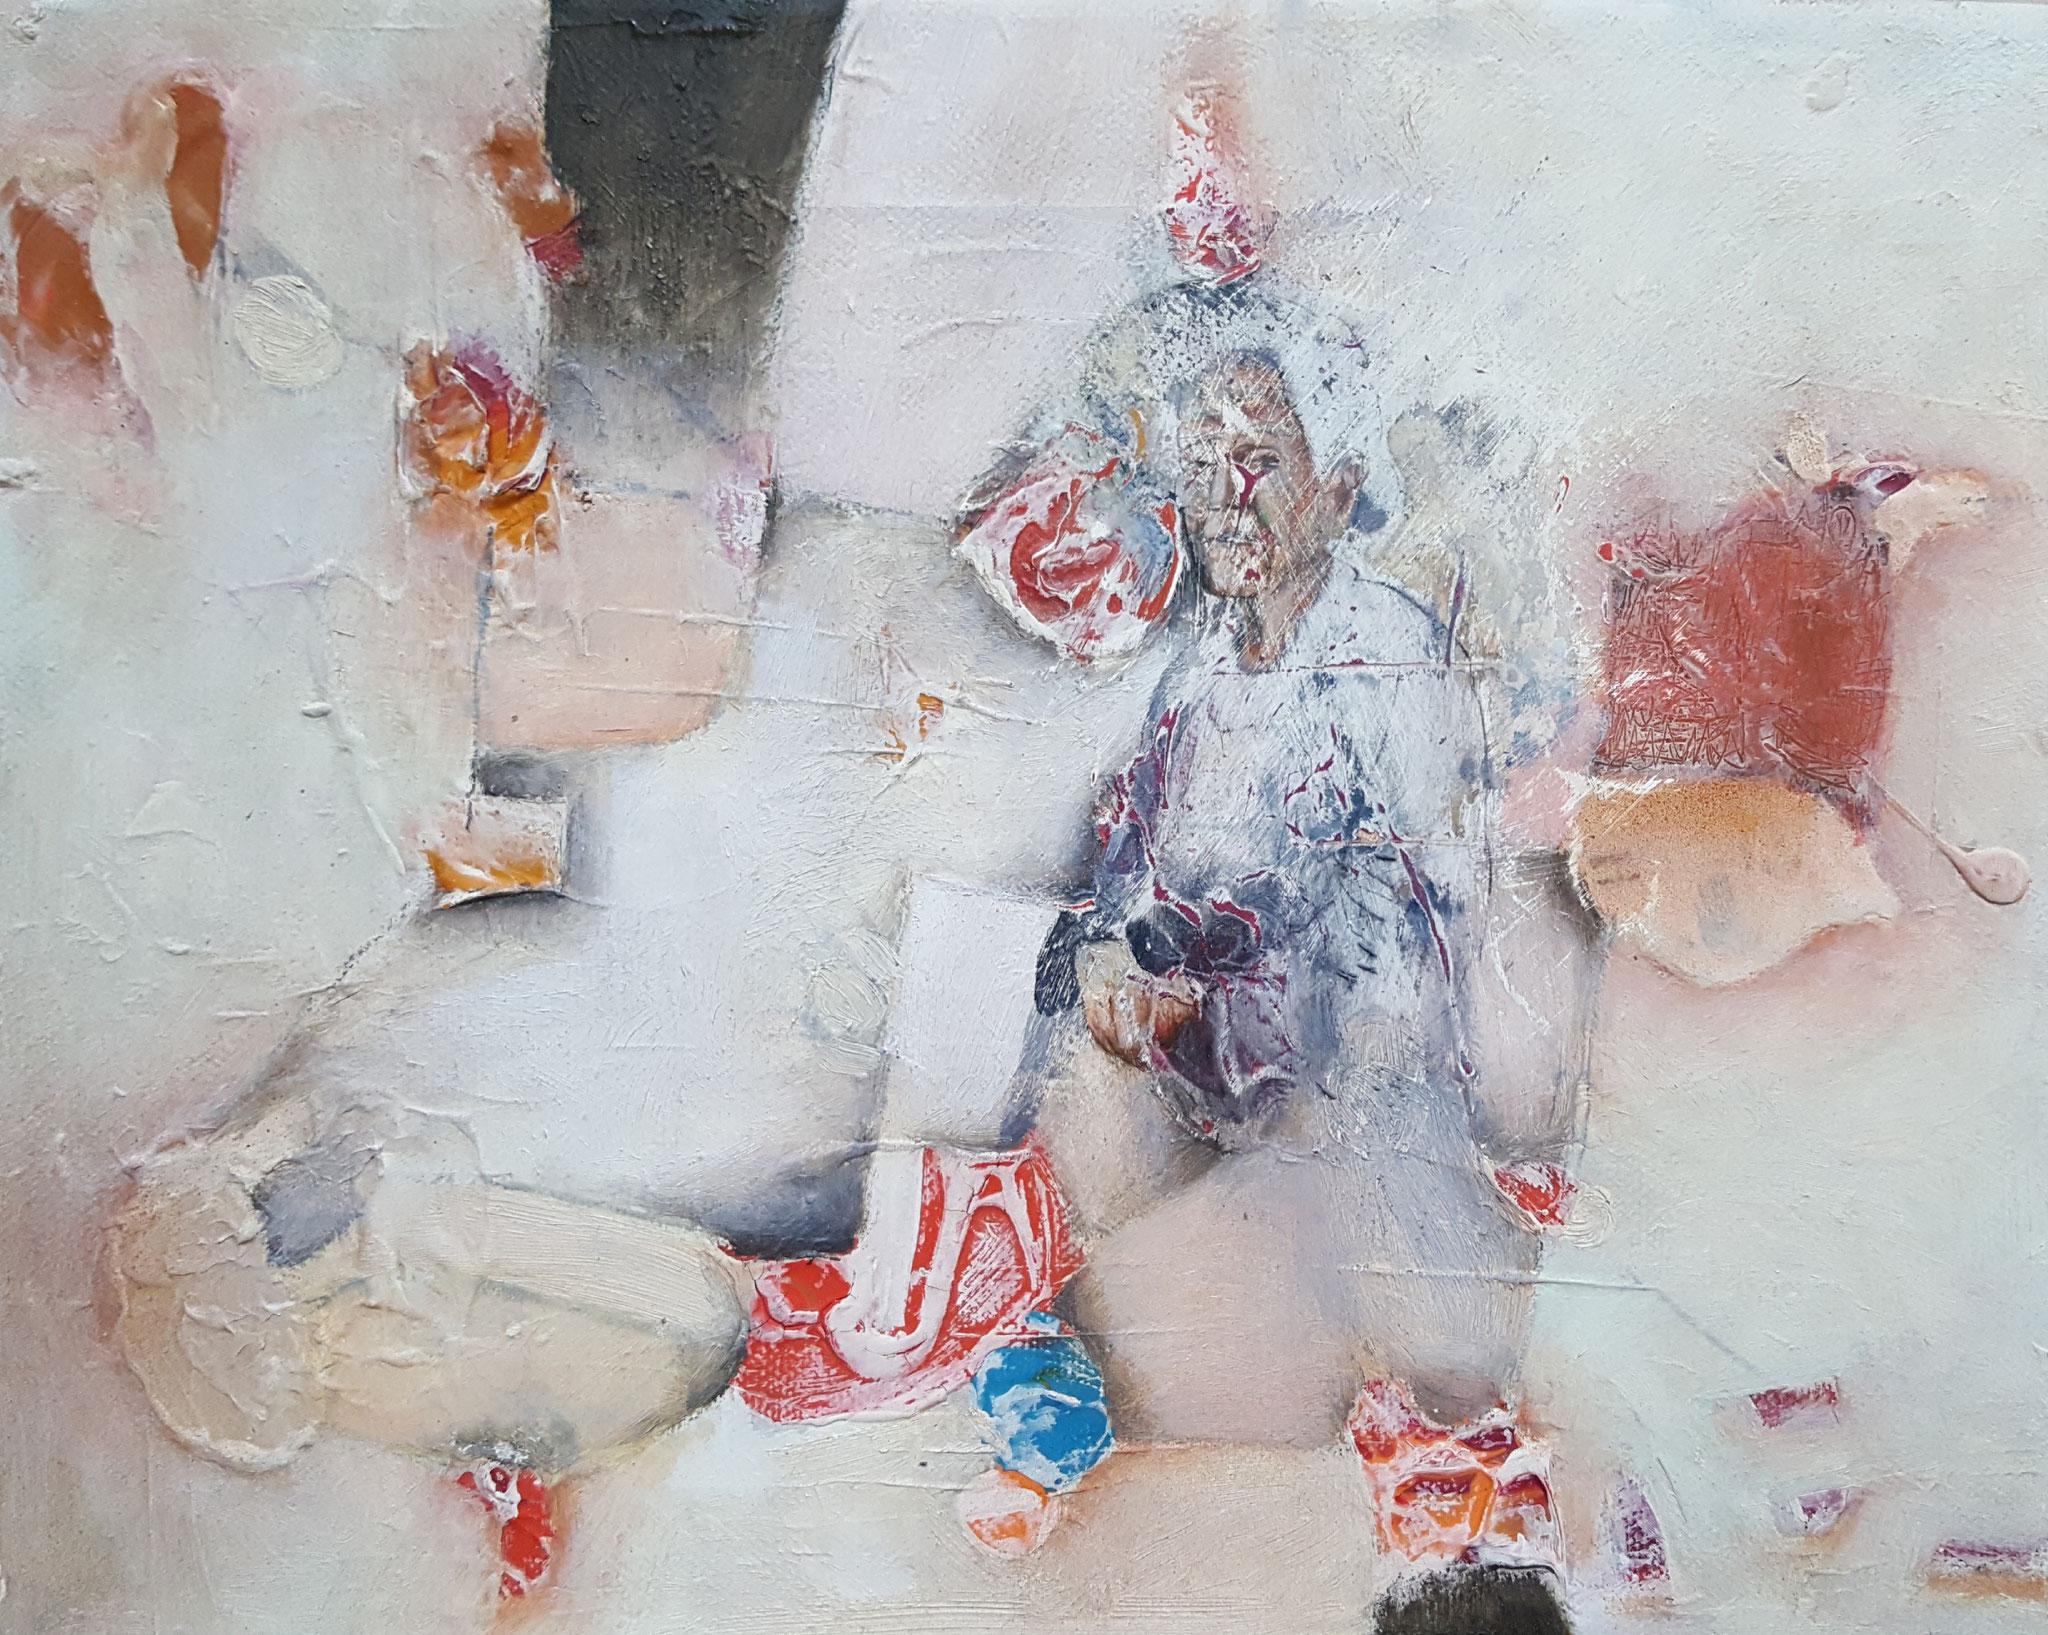 Des-aparecidos XVII, 2018, 30 x 20 cm, Mixed media on canvas